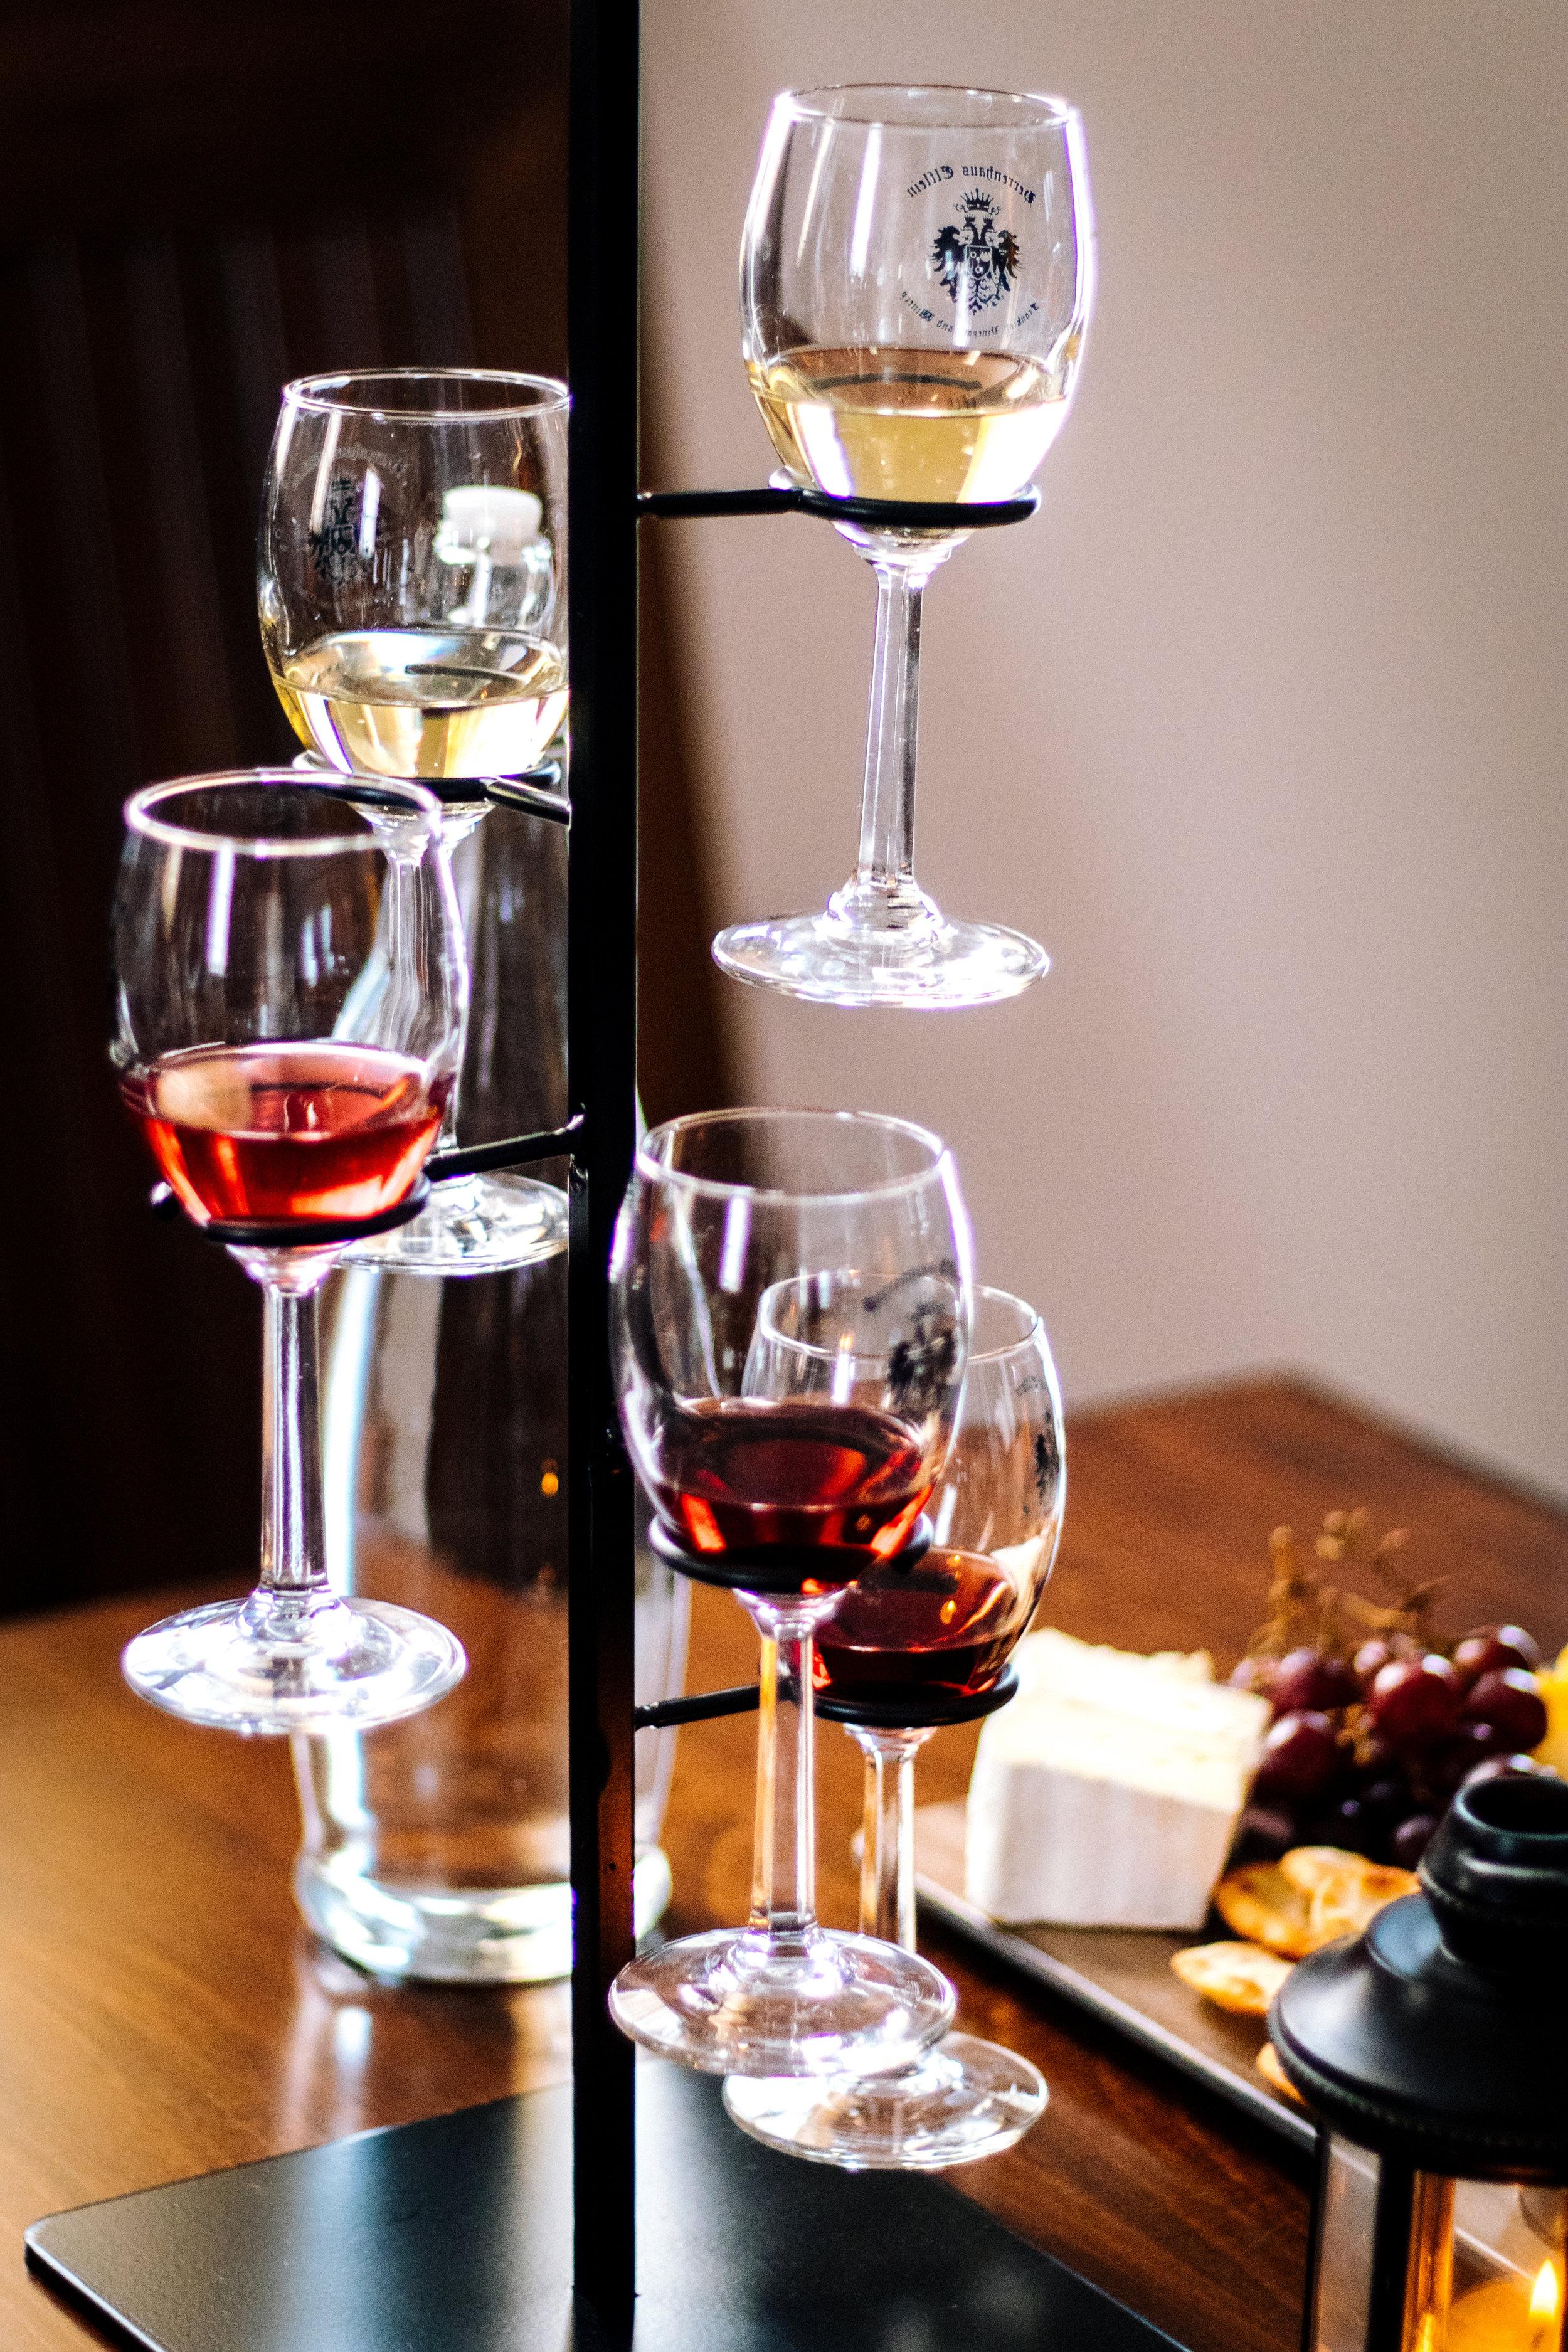 The Wines -